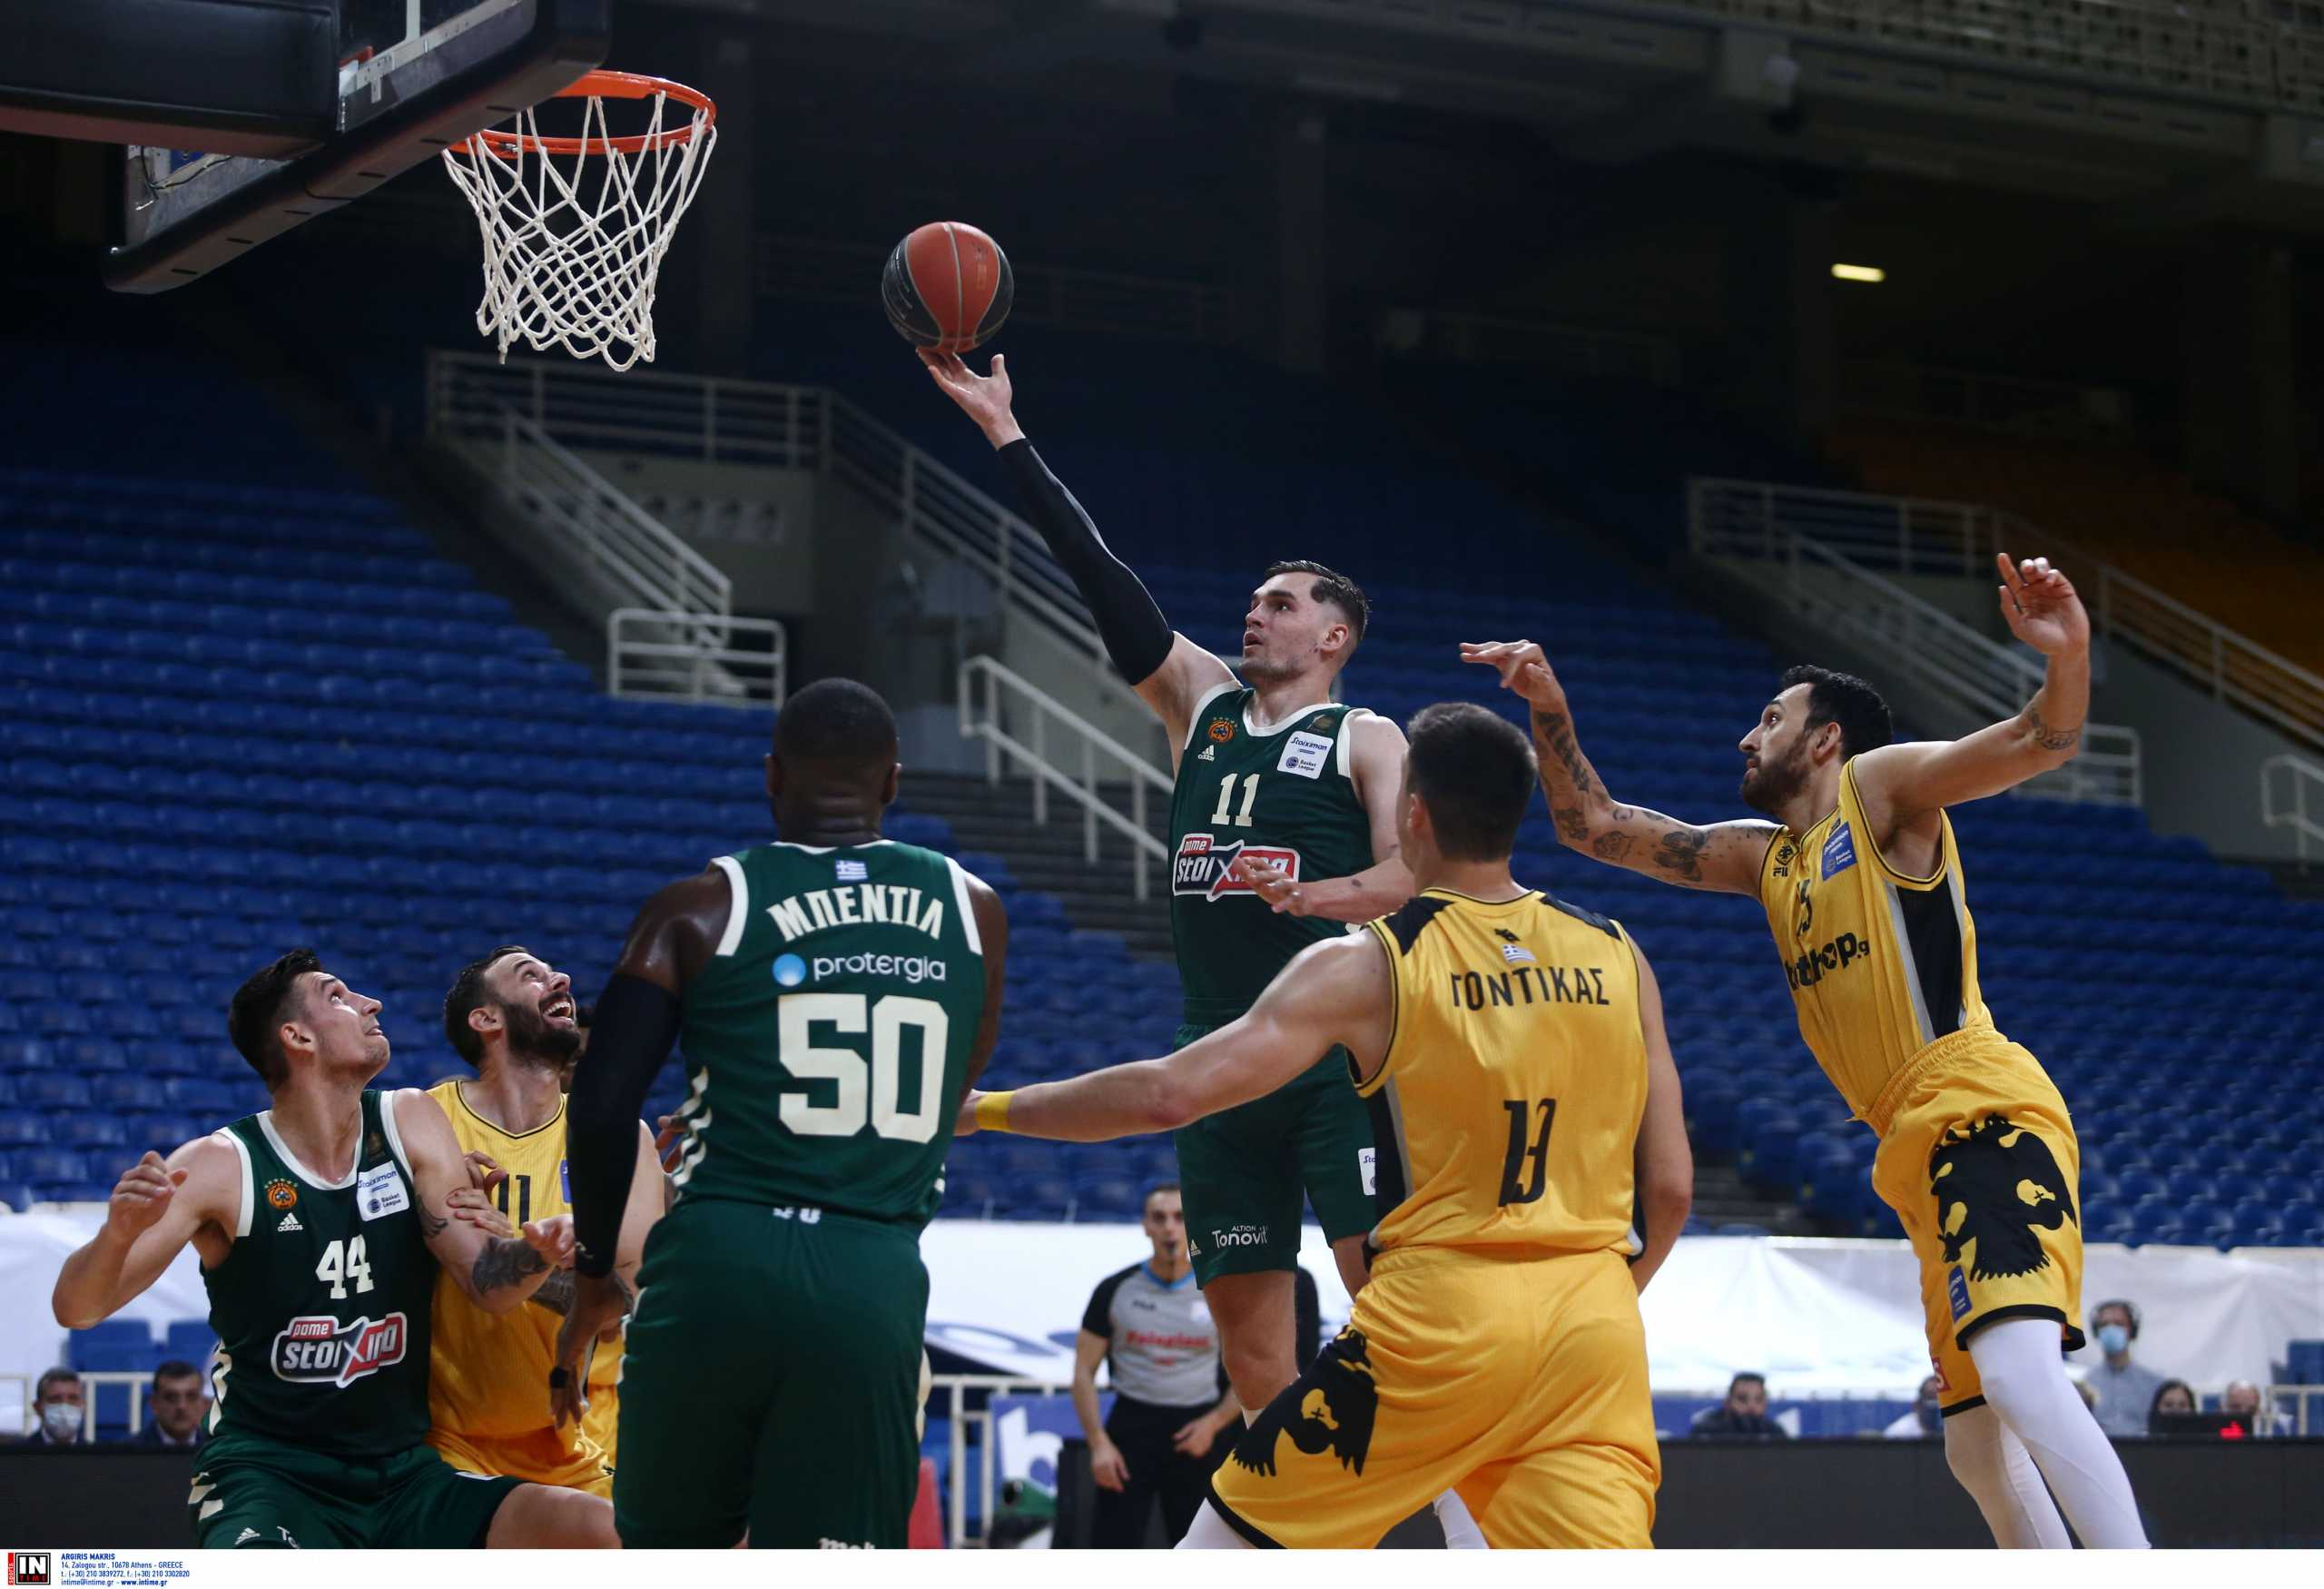 Basket League: Το πρόγραμμα των τελικών και των μικρών τελικών